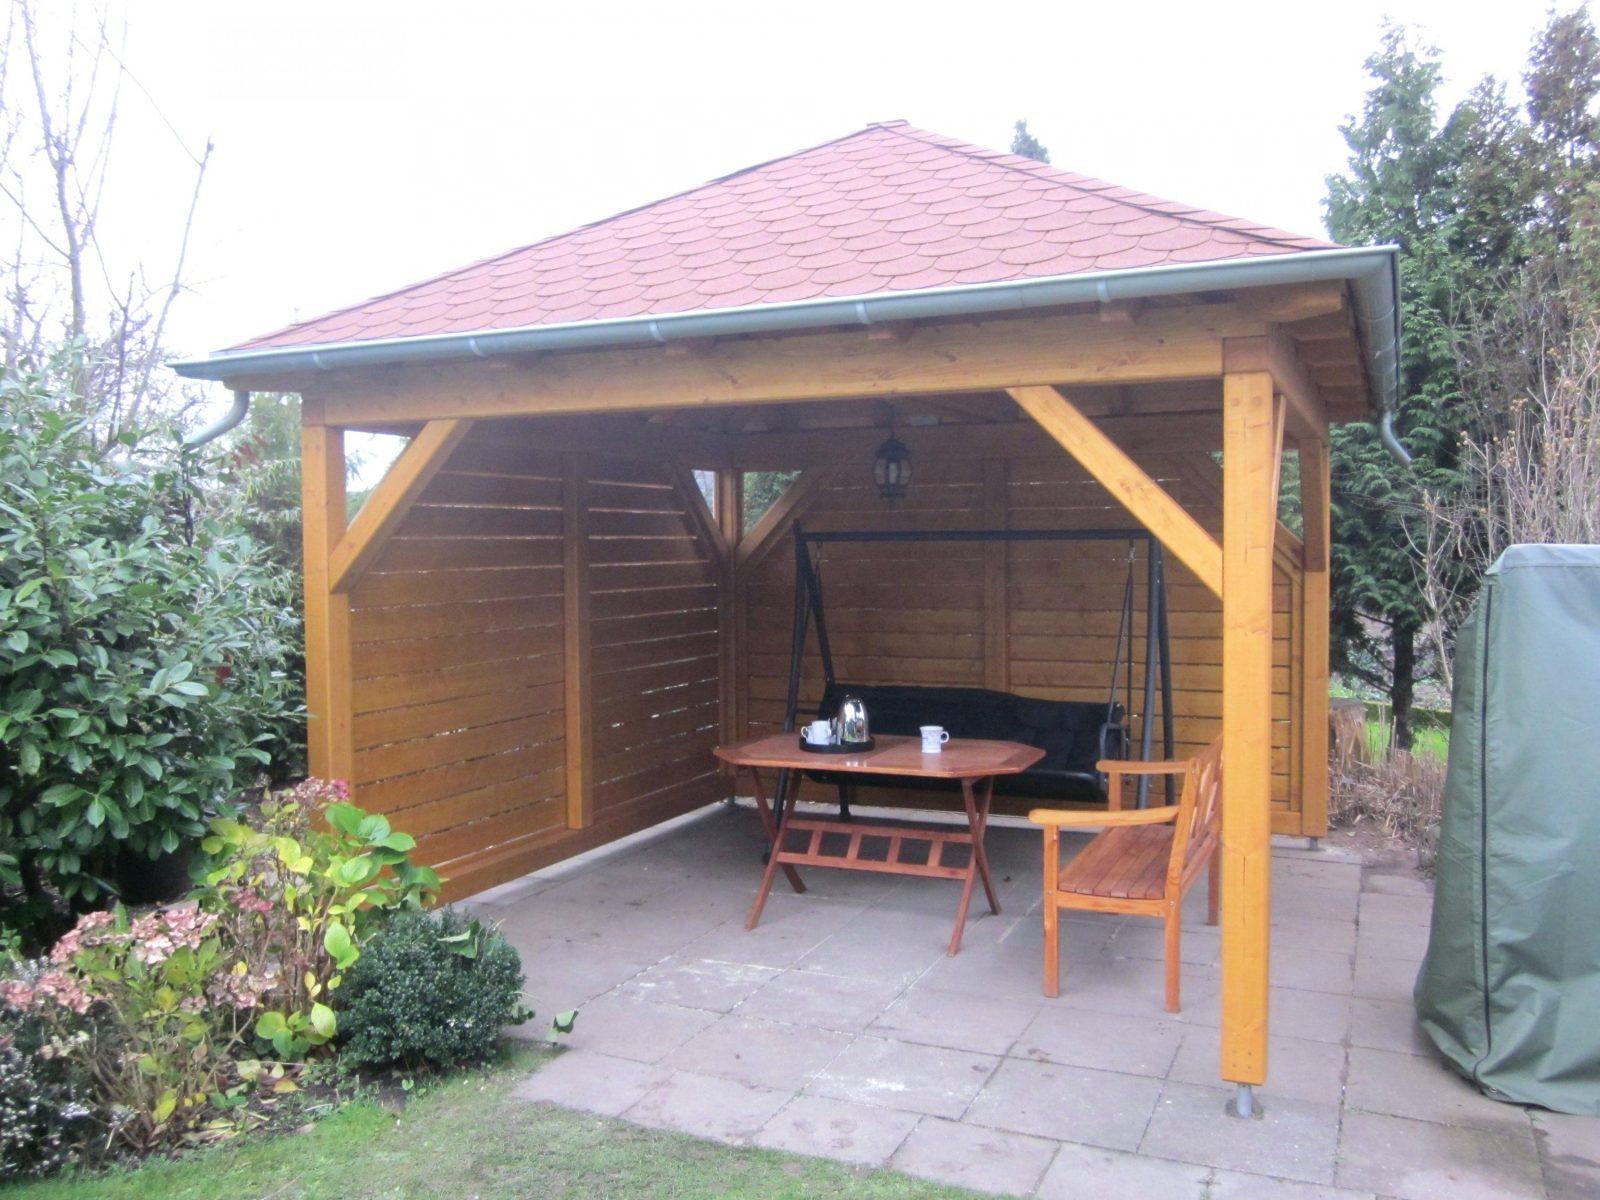 Holz Gartenpavillon Pavillon Aus Selber Bauen Bauanleitung Bauplan von Pavillon Holz Selber Bauen Bild